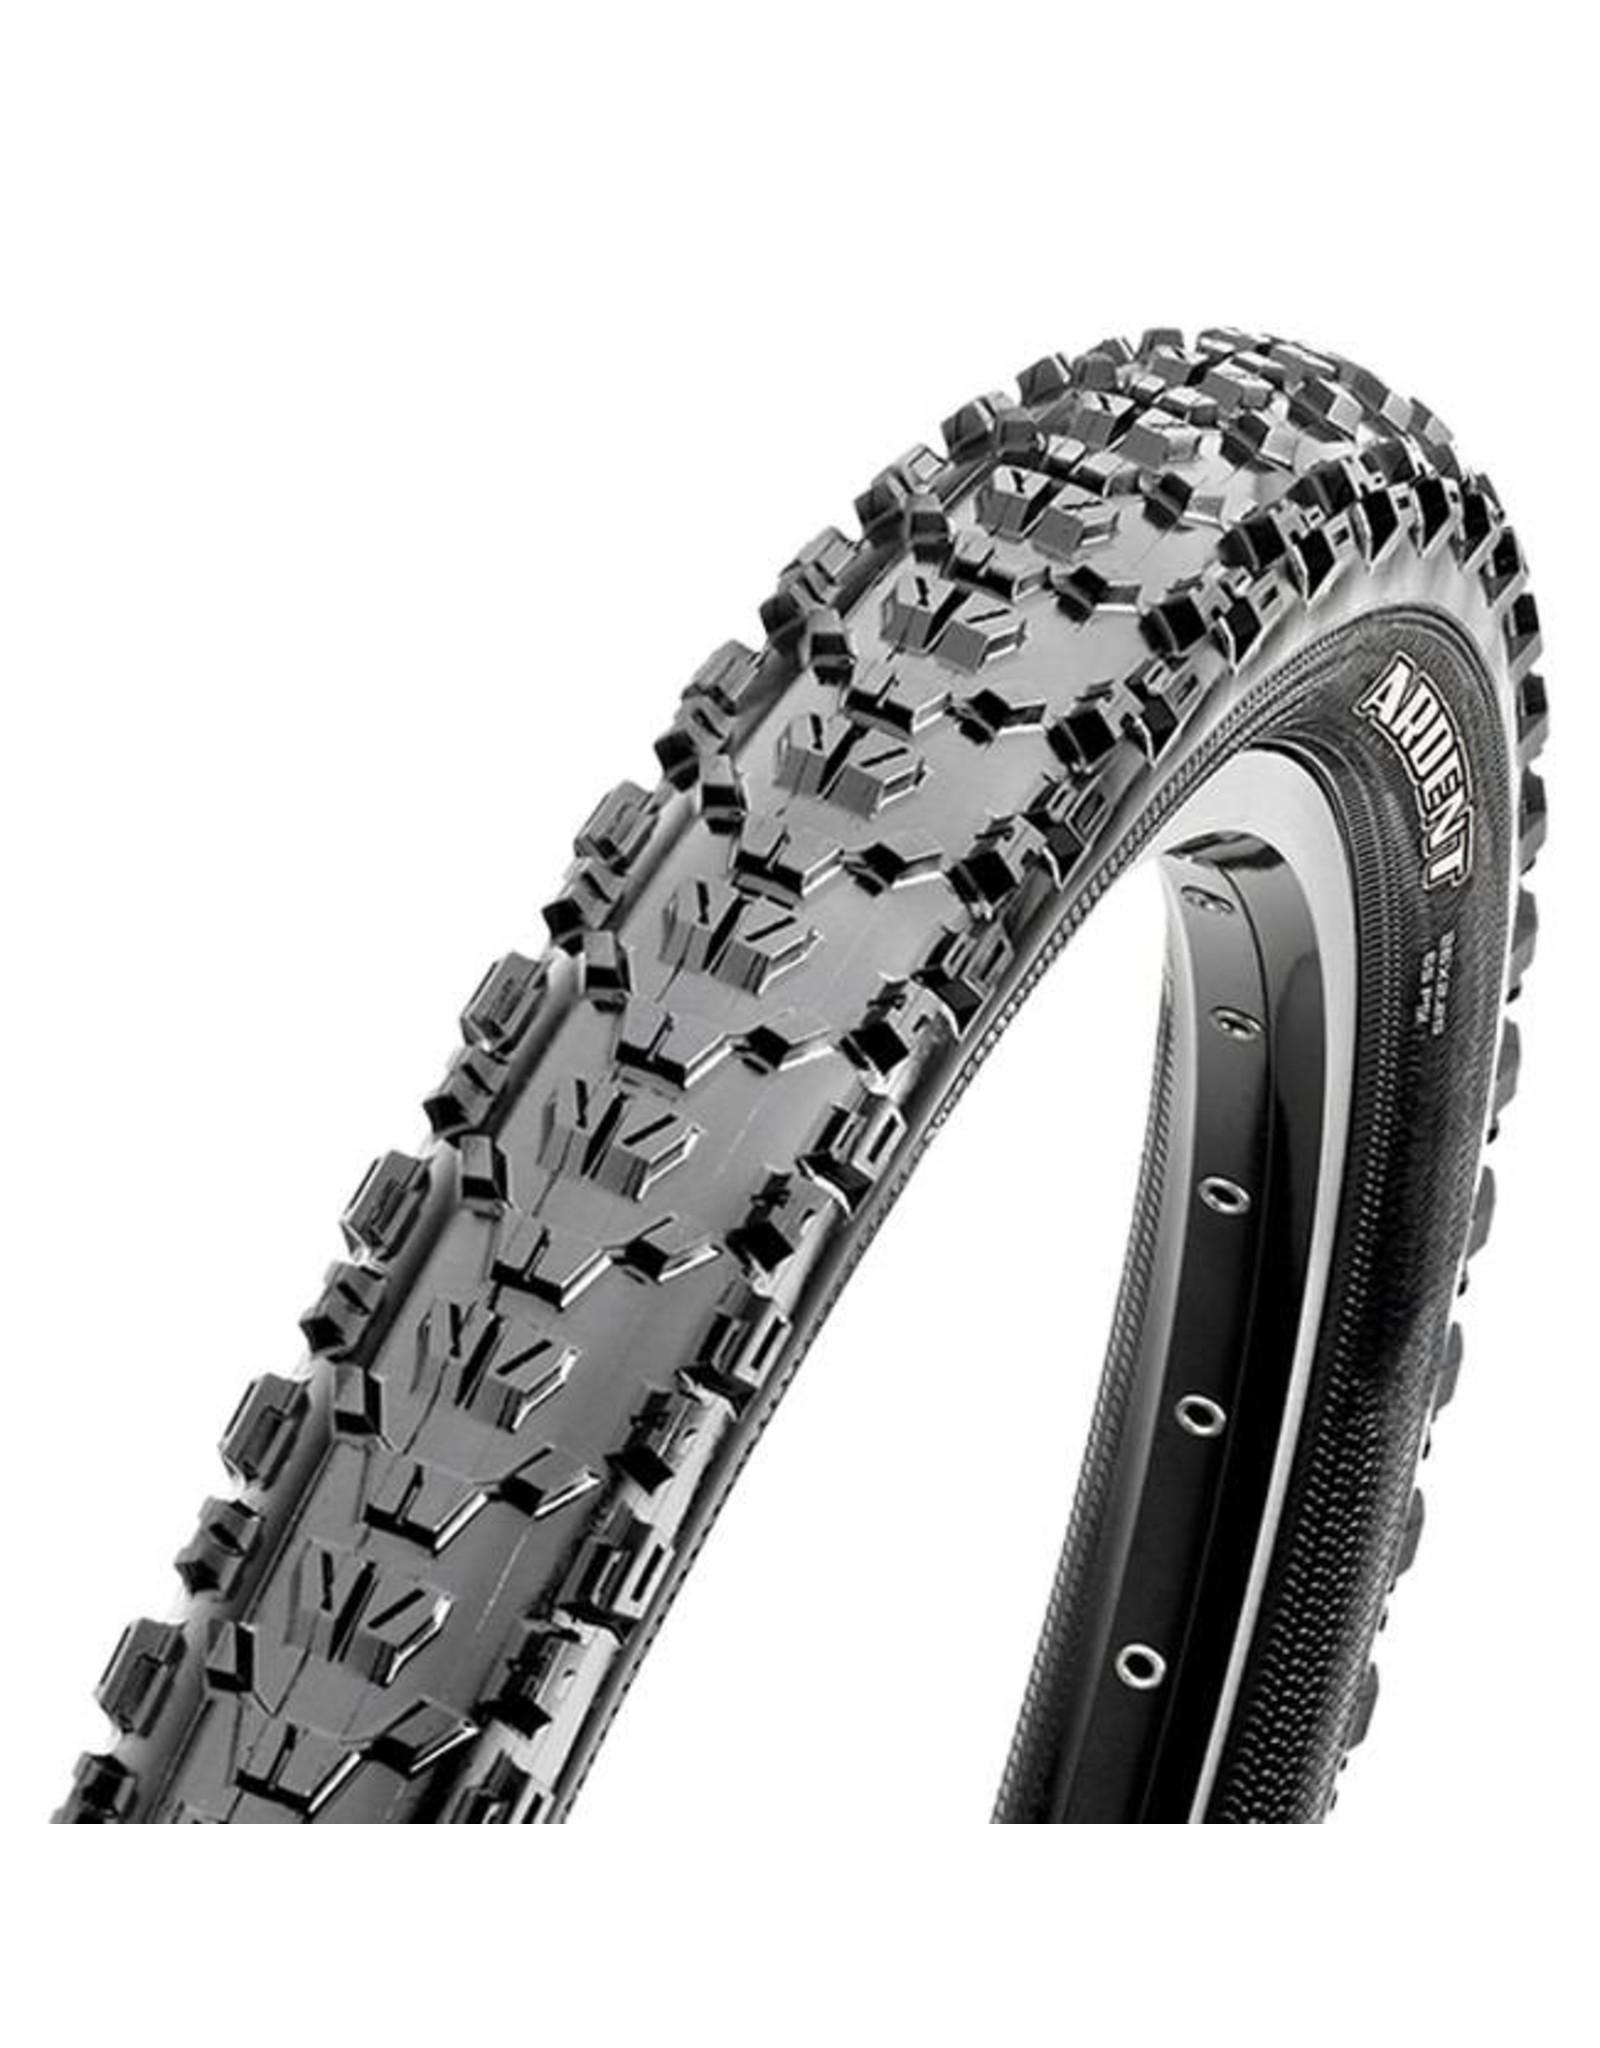 "Maxxis Maxxis Ardent Tire: 29 x 2.40"", Folding, 60tpi, Single Compound, EXO, Black"